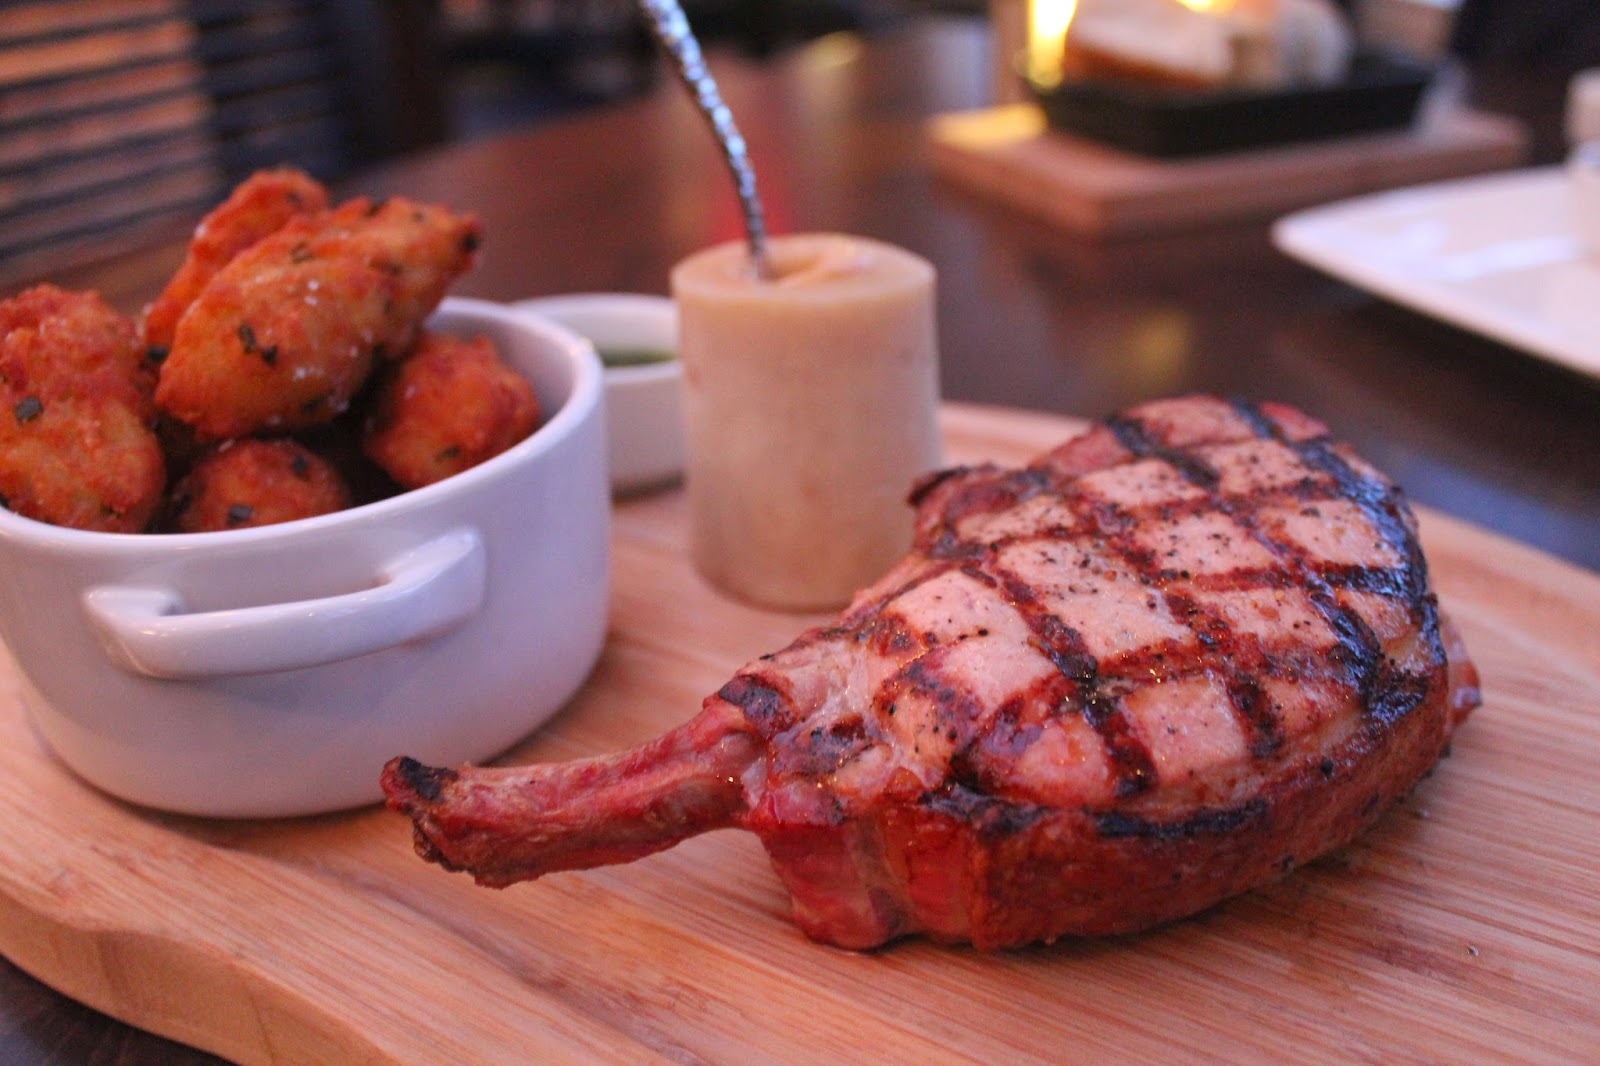 Pork chop at Chopps American Bar and Grill, Burlington, Mass.